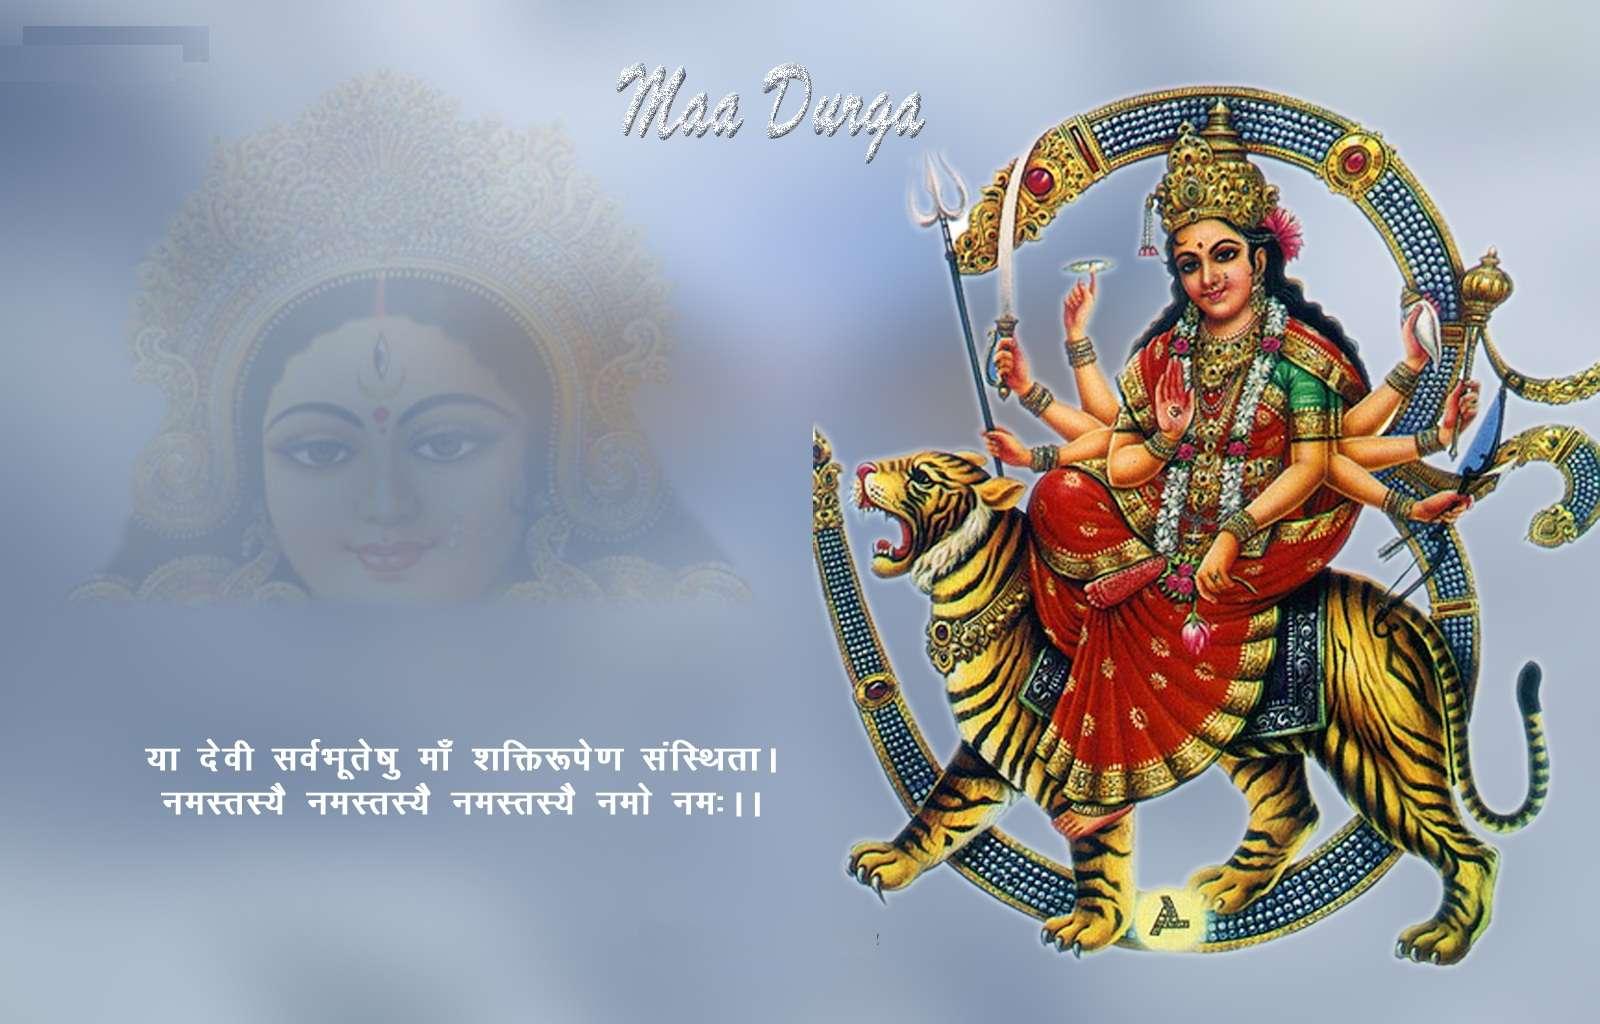 Khushi For Life Free Maa Durga Hd Desktop Wallpaper Photo Images